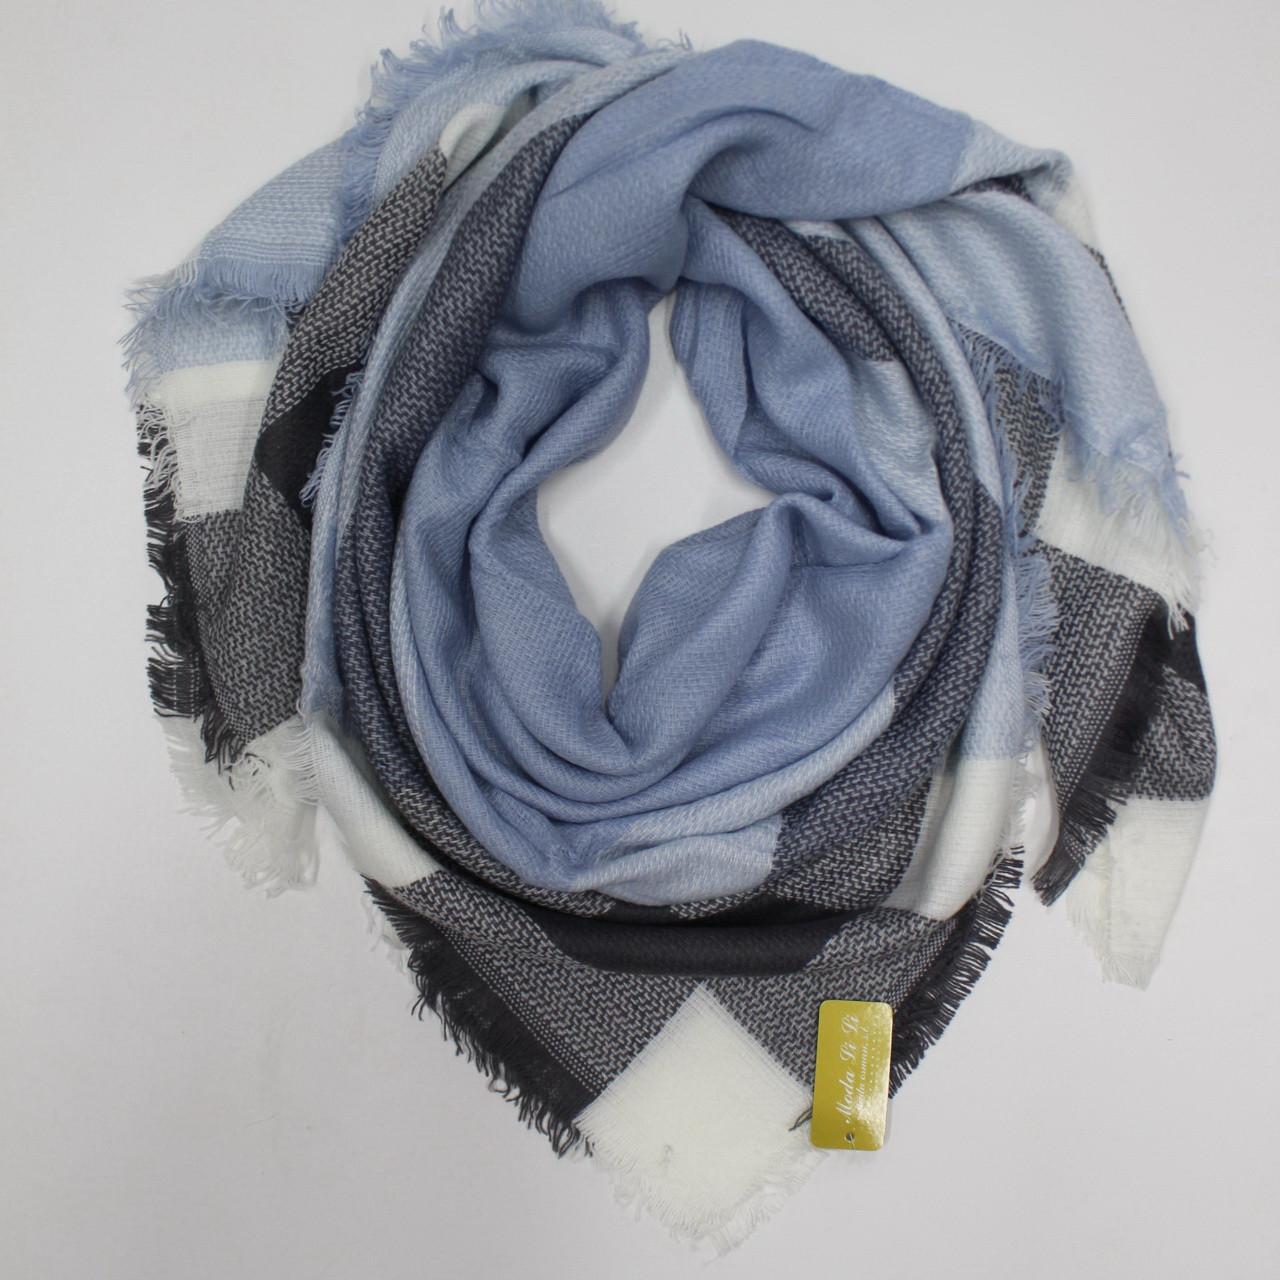 Большой теплый платок Cashmere 214002